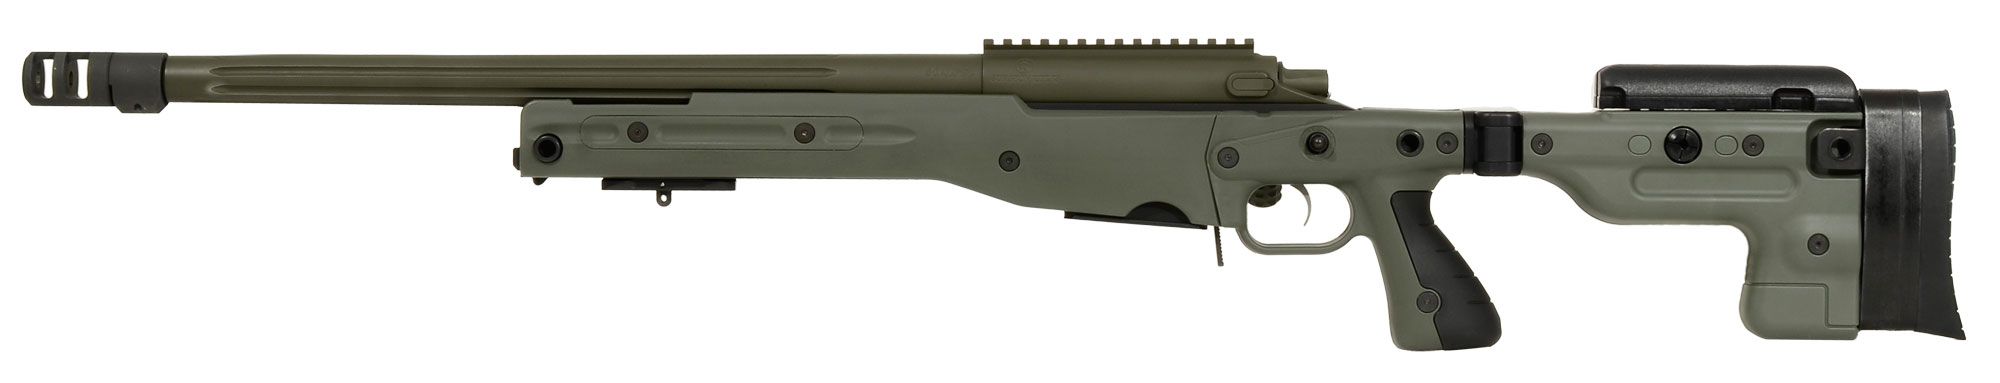 Surgeon Scalpel 308 Winchester Green Rifle